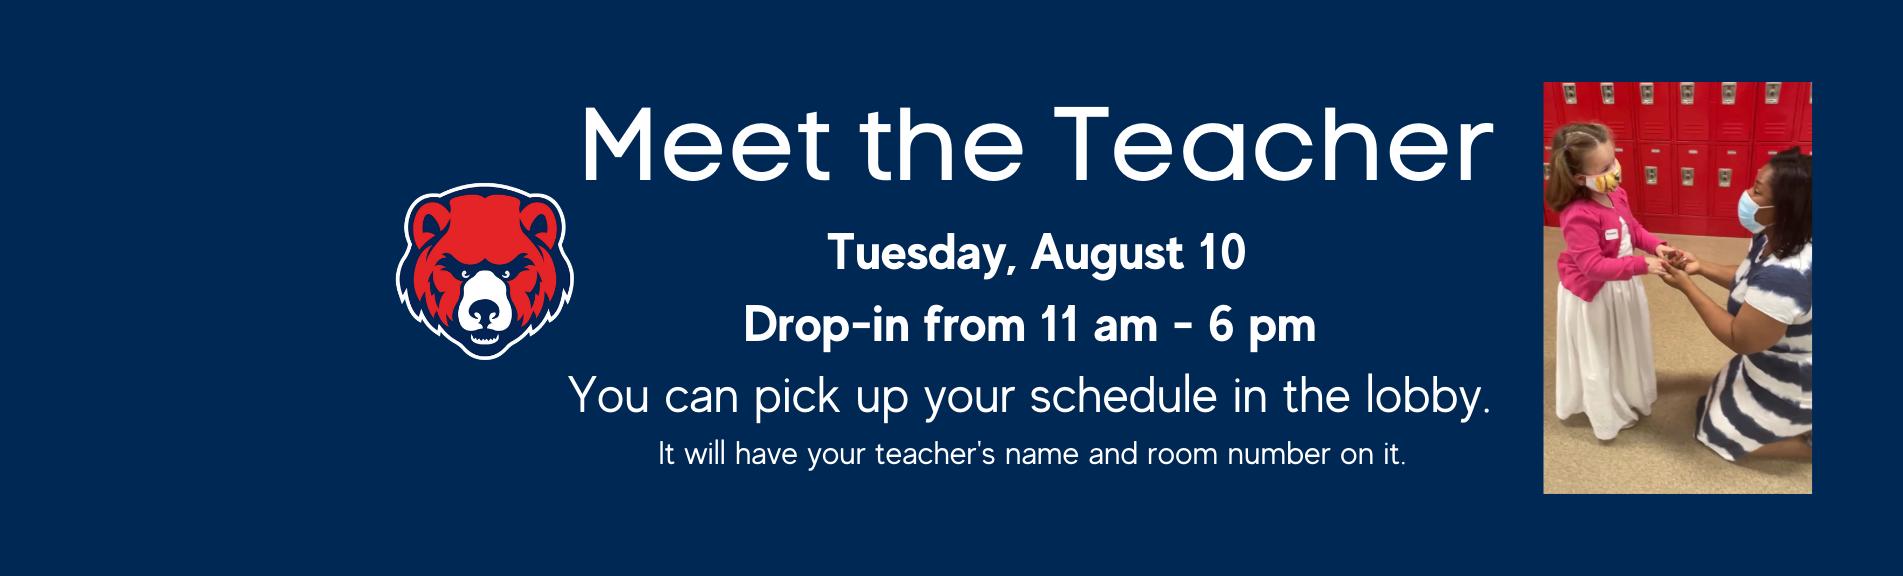 Meet the Teacher at HPA August 10